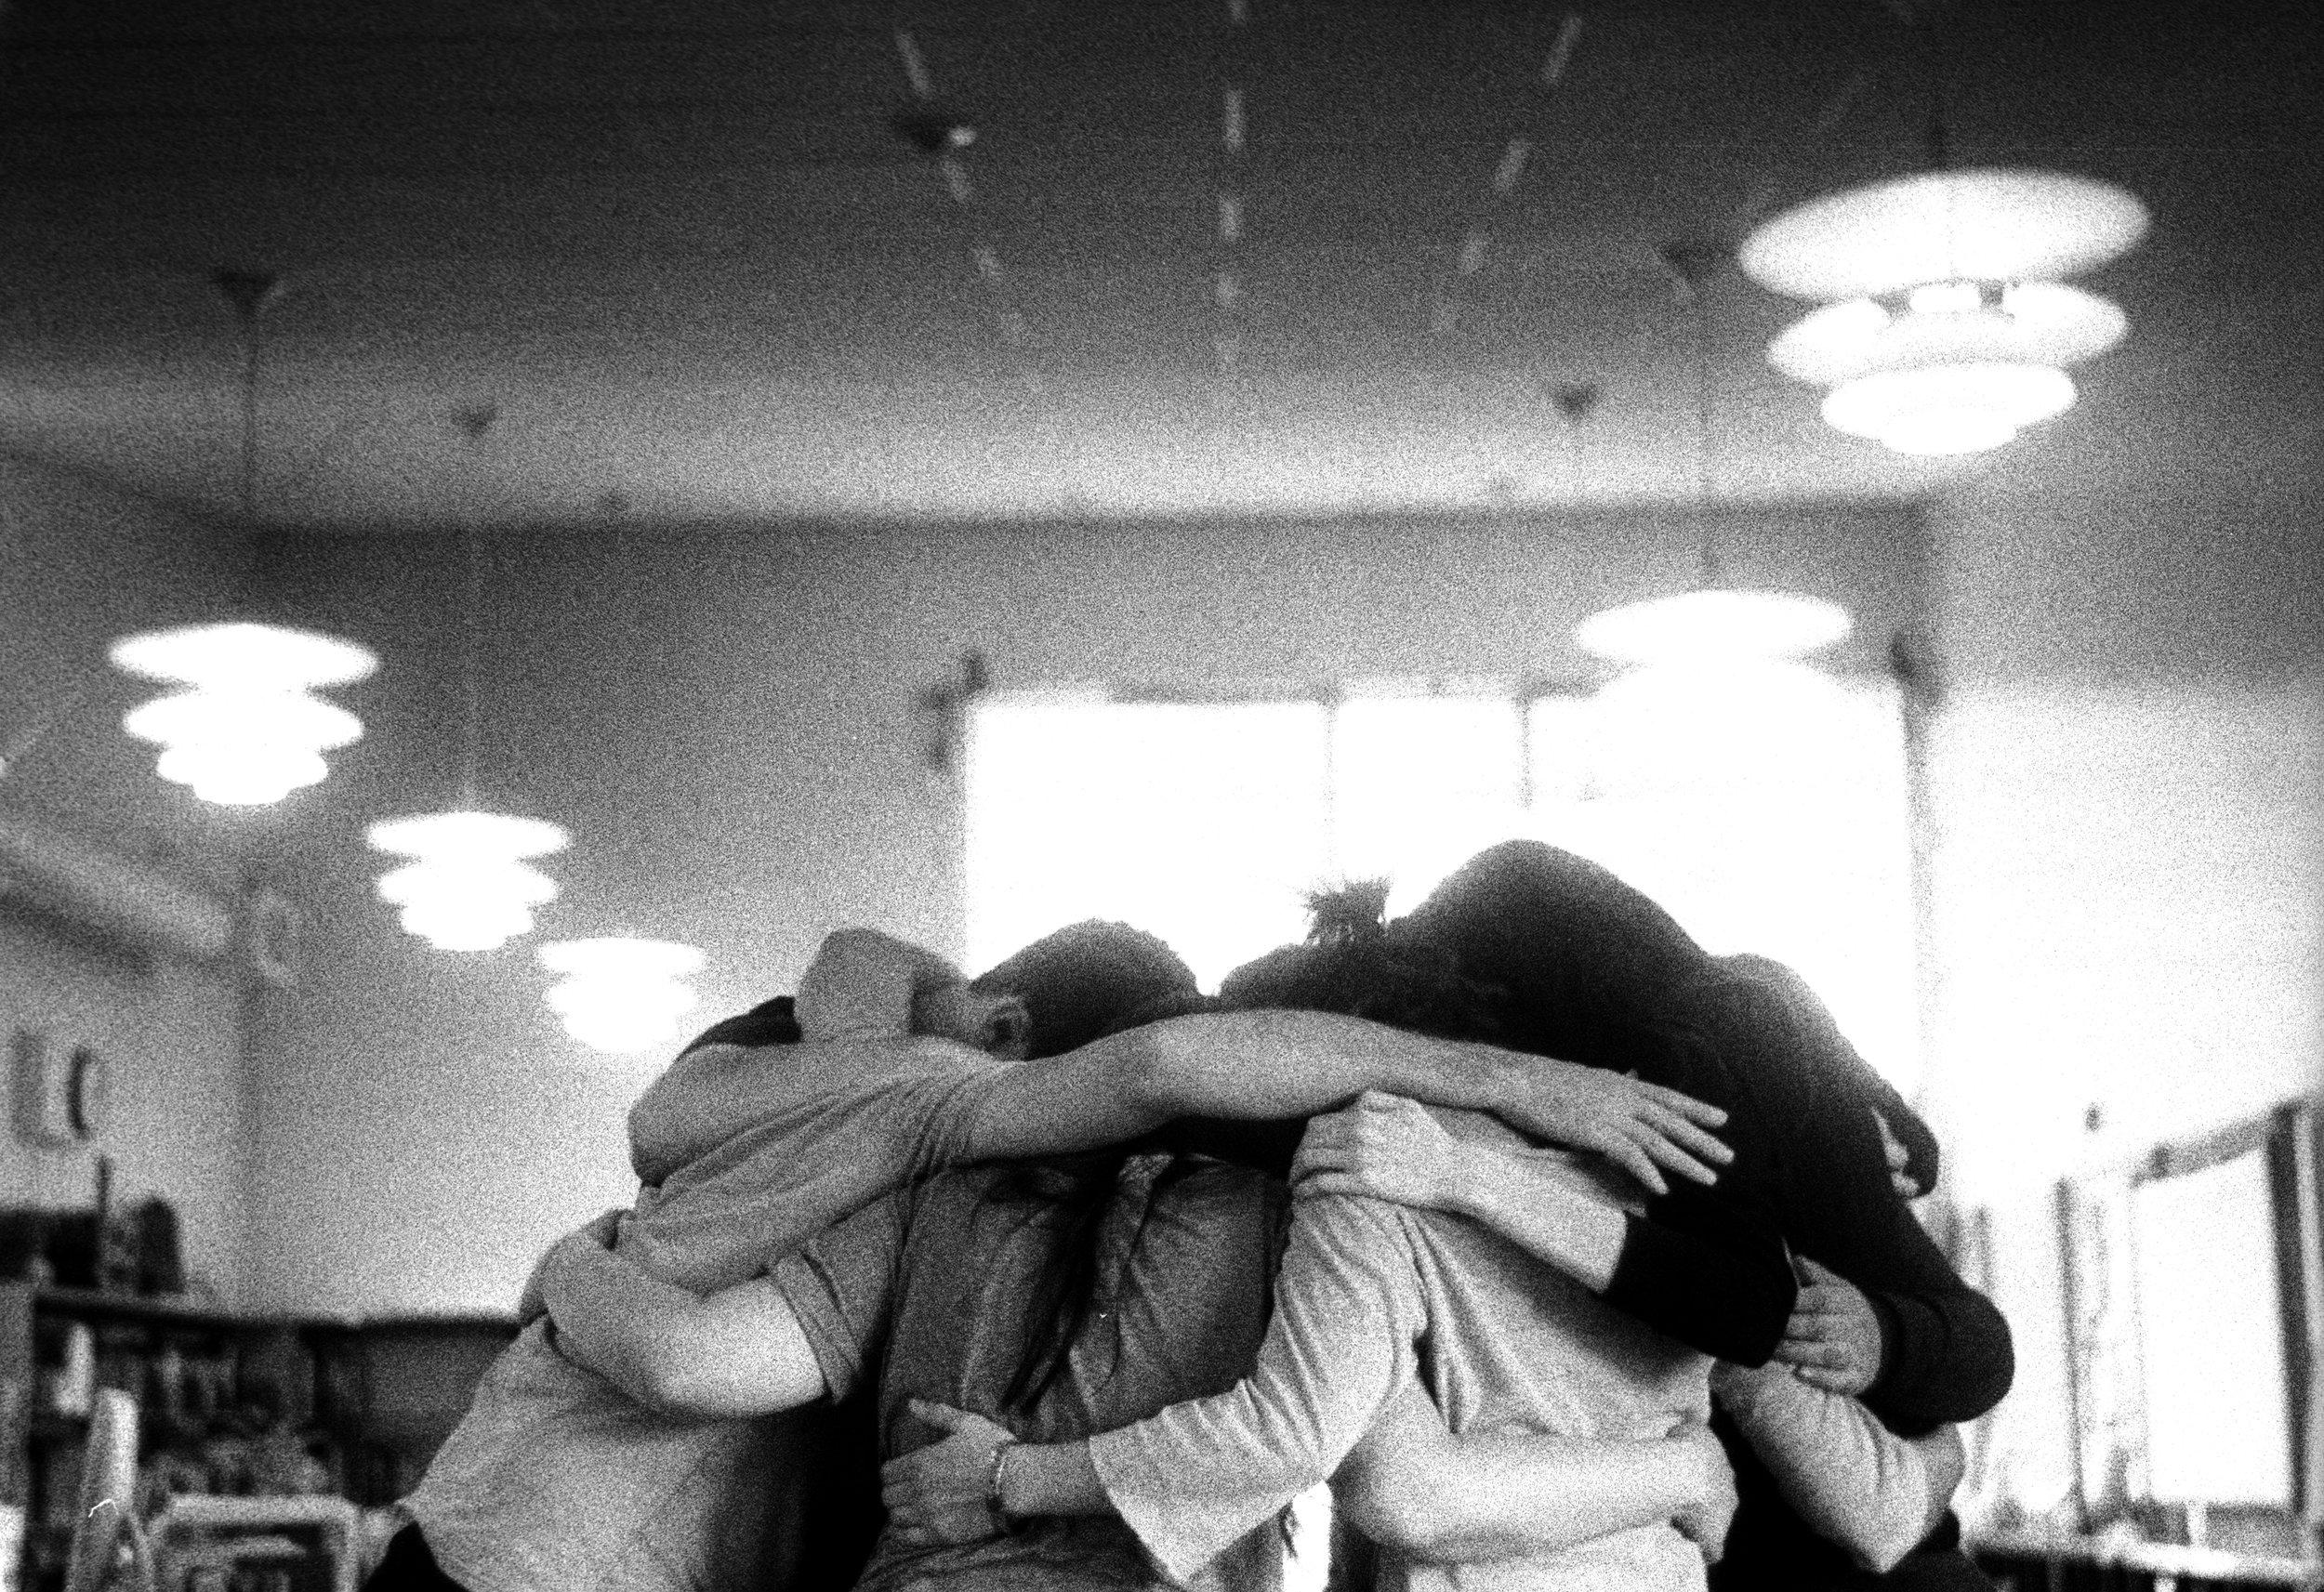 bw_unity.jpg